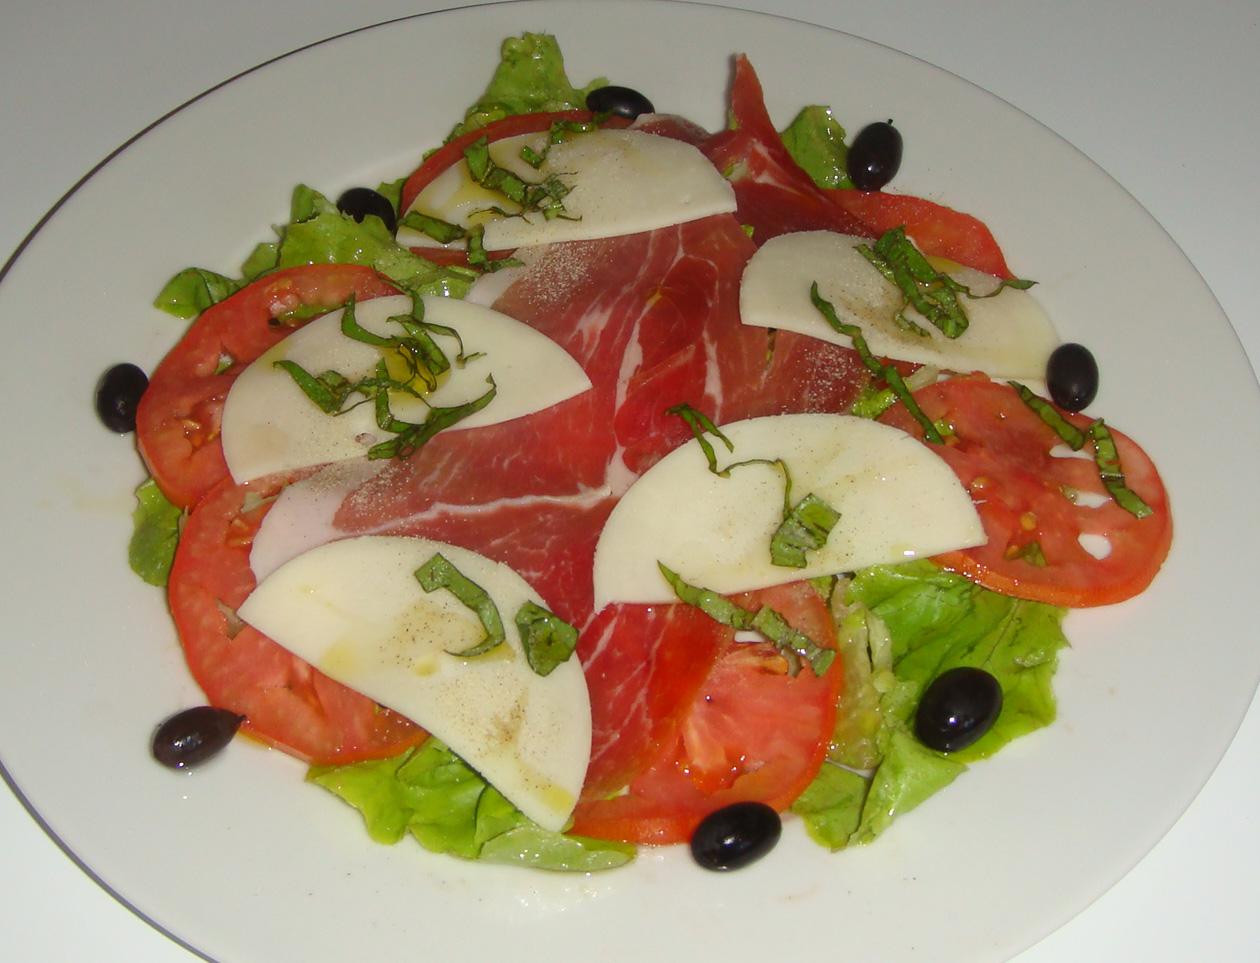 les recettes faciles de martine salade italienne. Black Bedroom Furniture Sets. Home Design Ideas